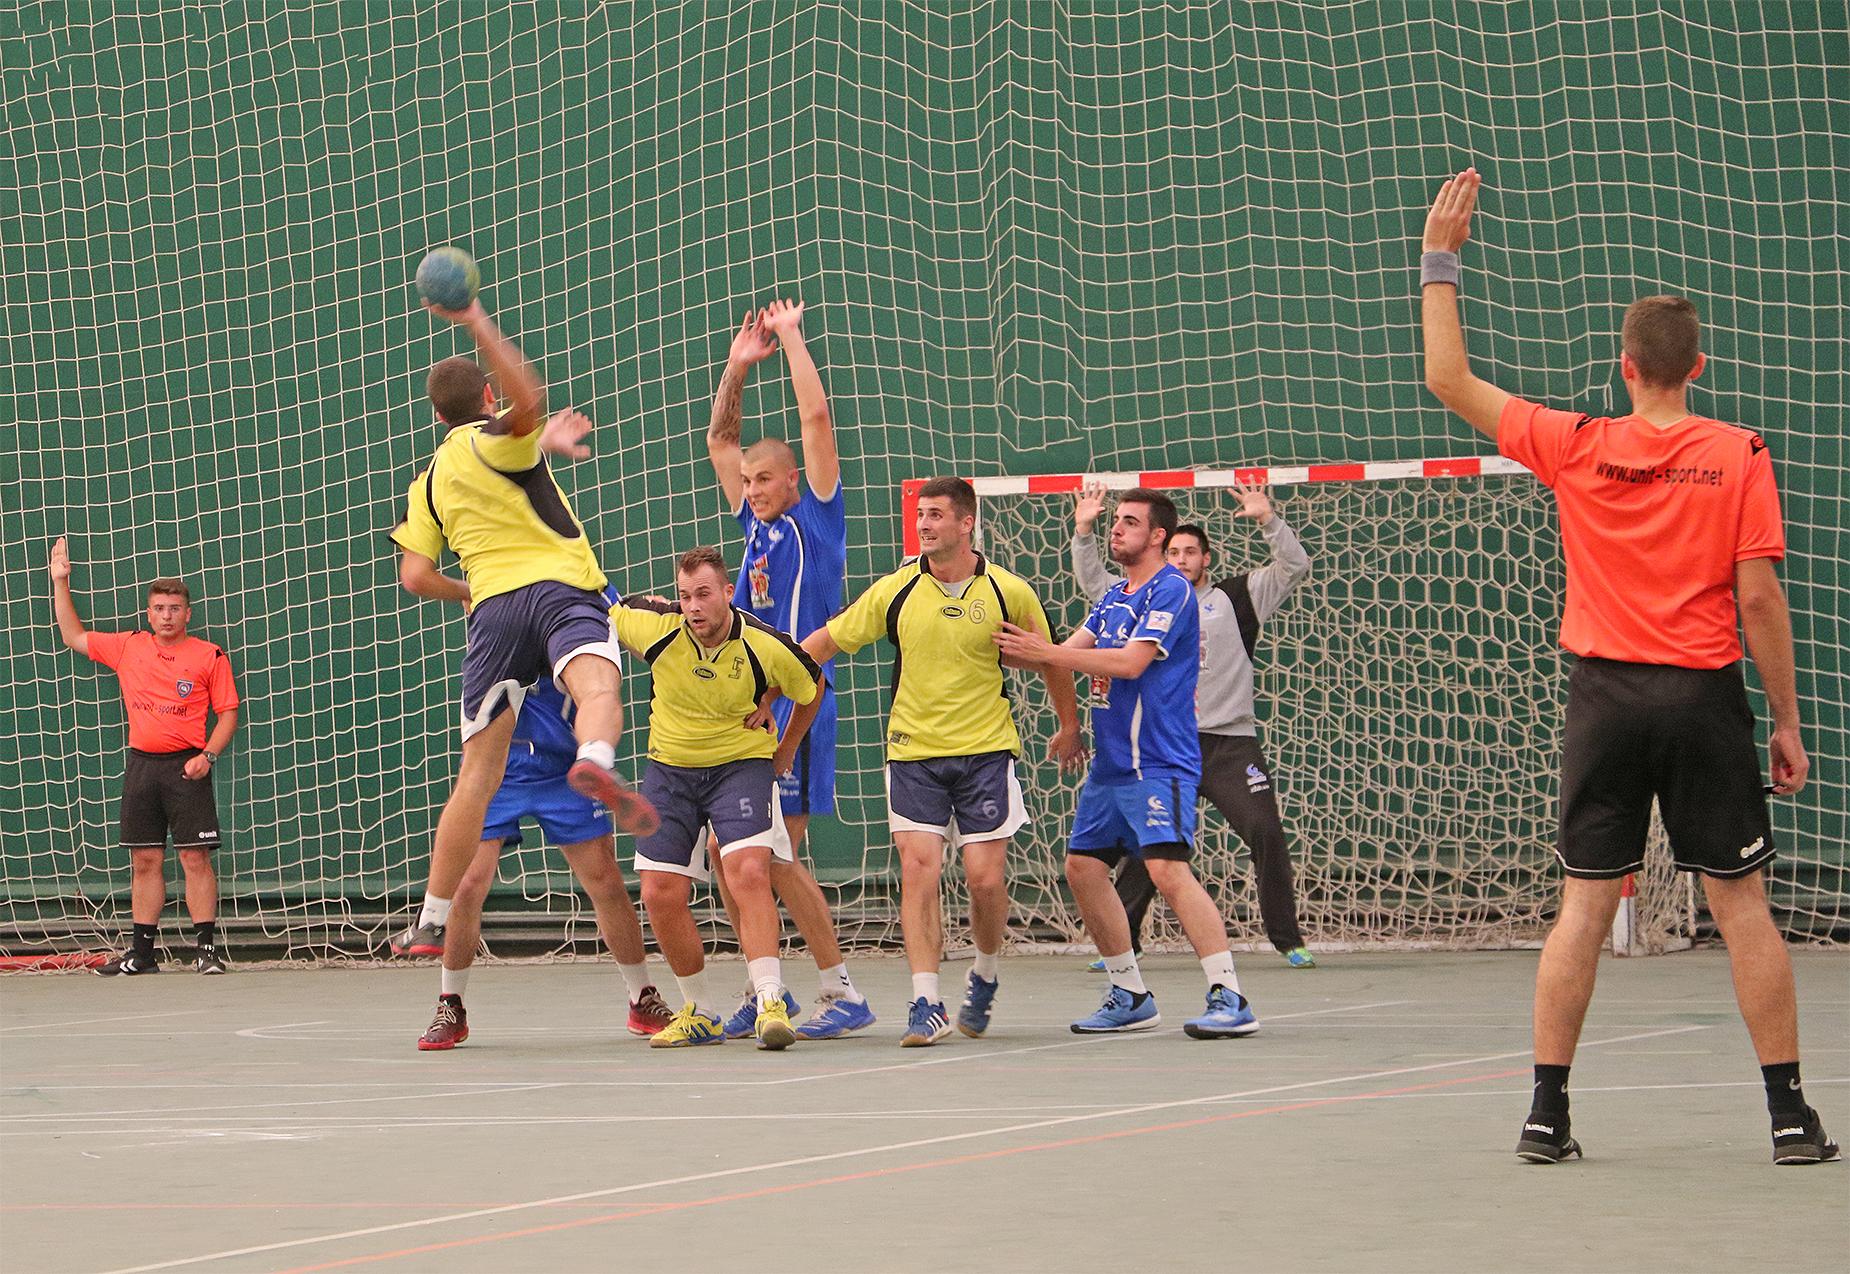 Rukometna utakmica između ''Progresa'' i ''Železničara'' iz Niša, foto: M.M. / Svrljiške novine